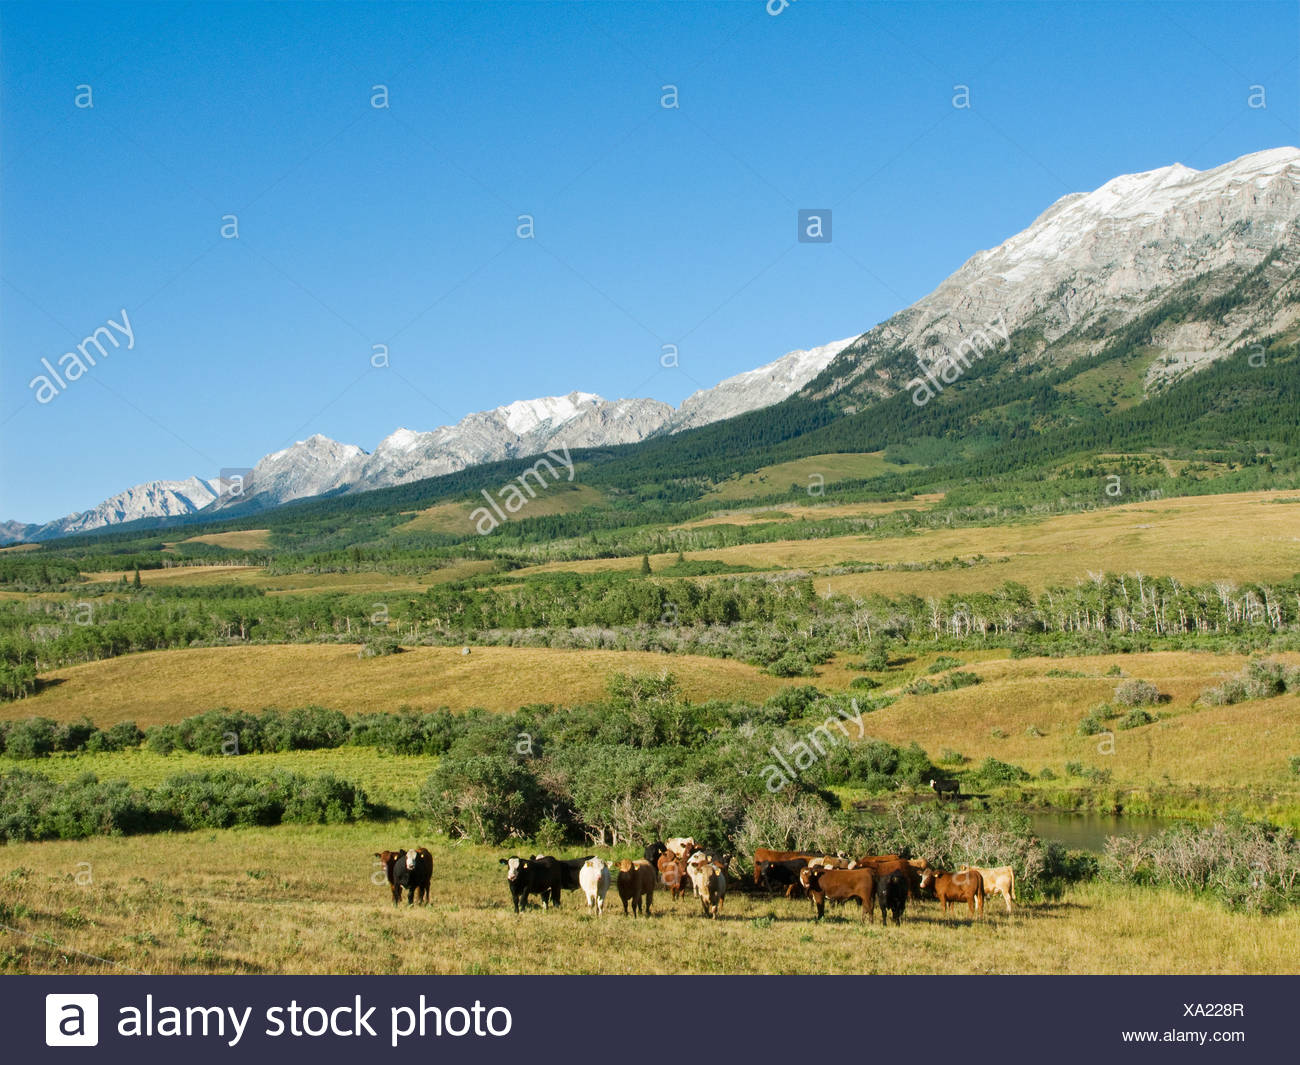 Livestock - Mixed breeds of beef steers on native rangelands in the Canadian Rockies / Alberta, Canada. - Stock Image